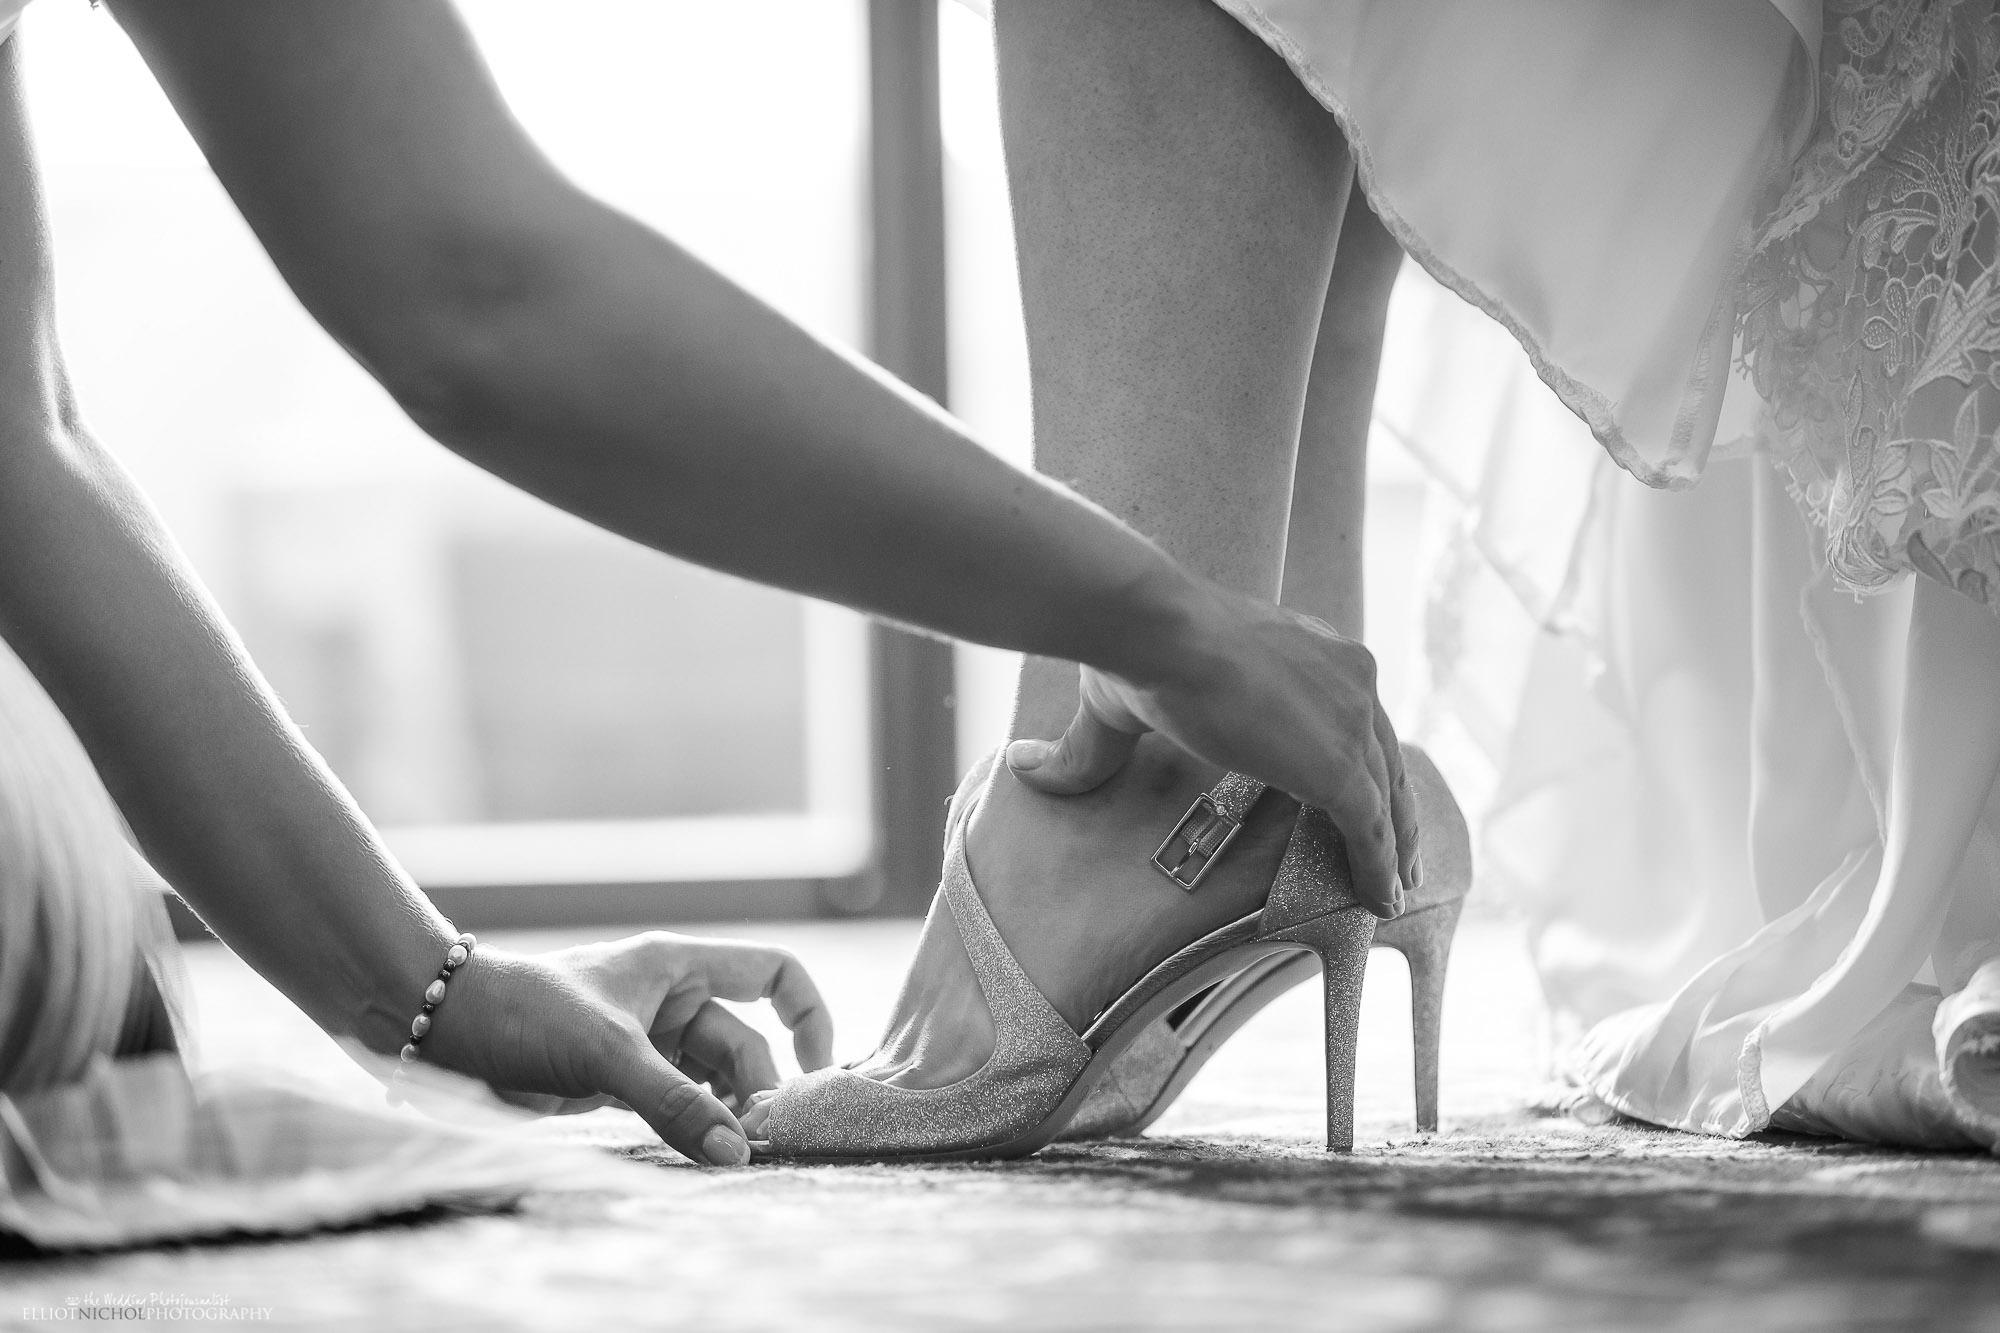 brides-wedding-bride-shoes-bridesmaid-wedding-day-photography-Northeast-Photographer